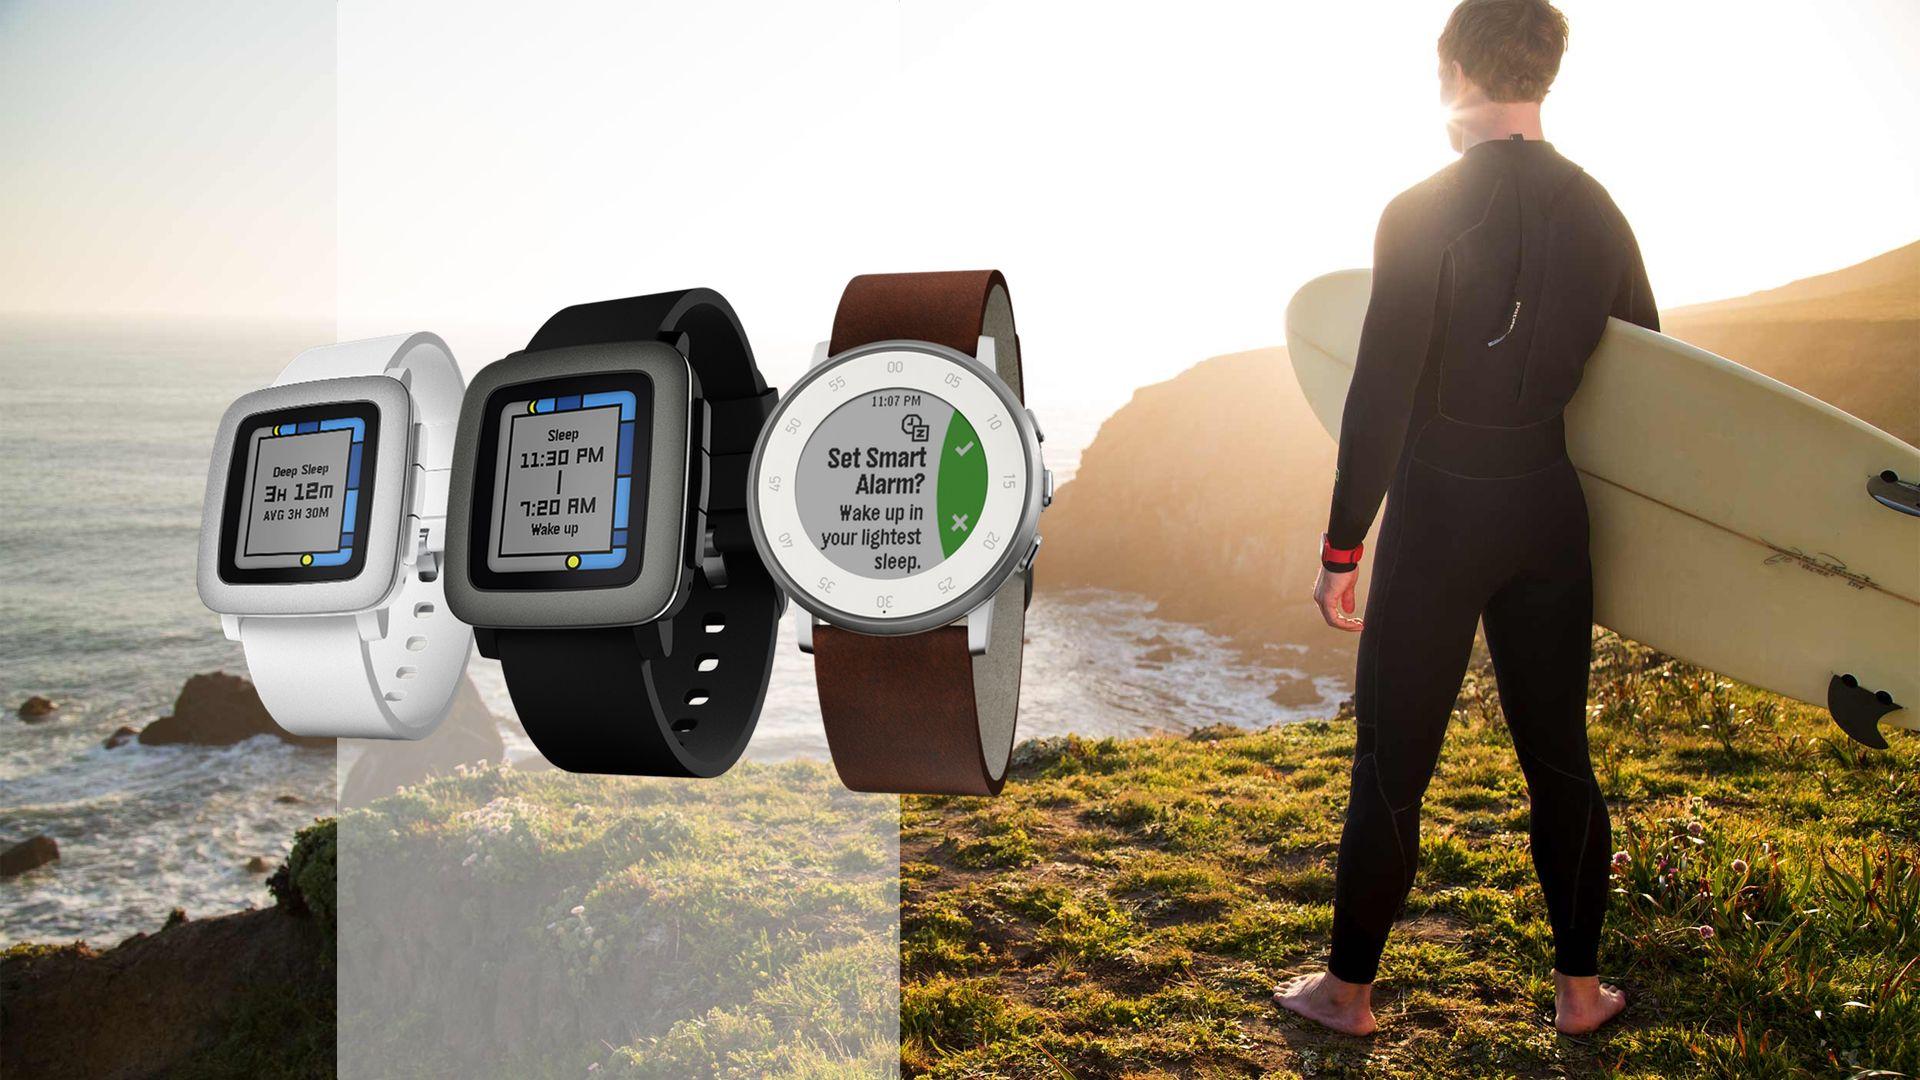 Smartwatch full hd wallpaper